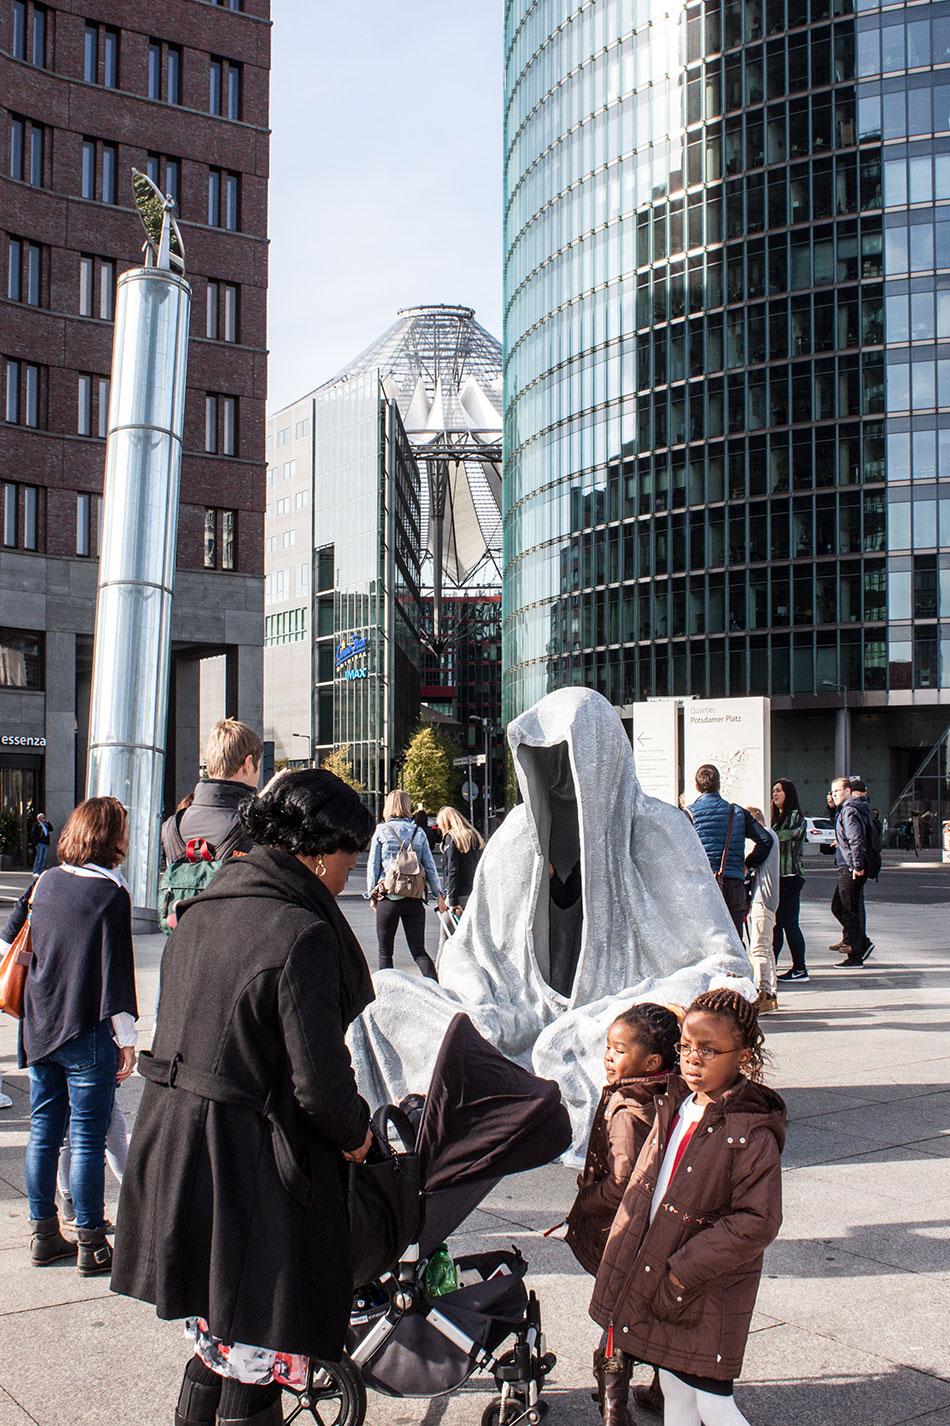 festival-of-lights-berlin-potzdamer-platz-light-art-show-exhibition-lumina-guardians-of-time-manfred-kili-kielnhofer-contemporary-arts-design-sculpture-3090 - Kopie